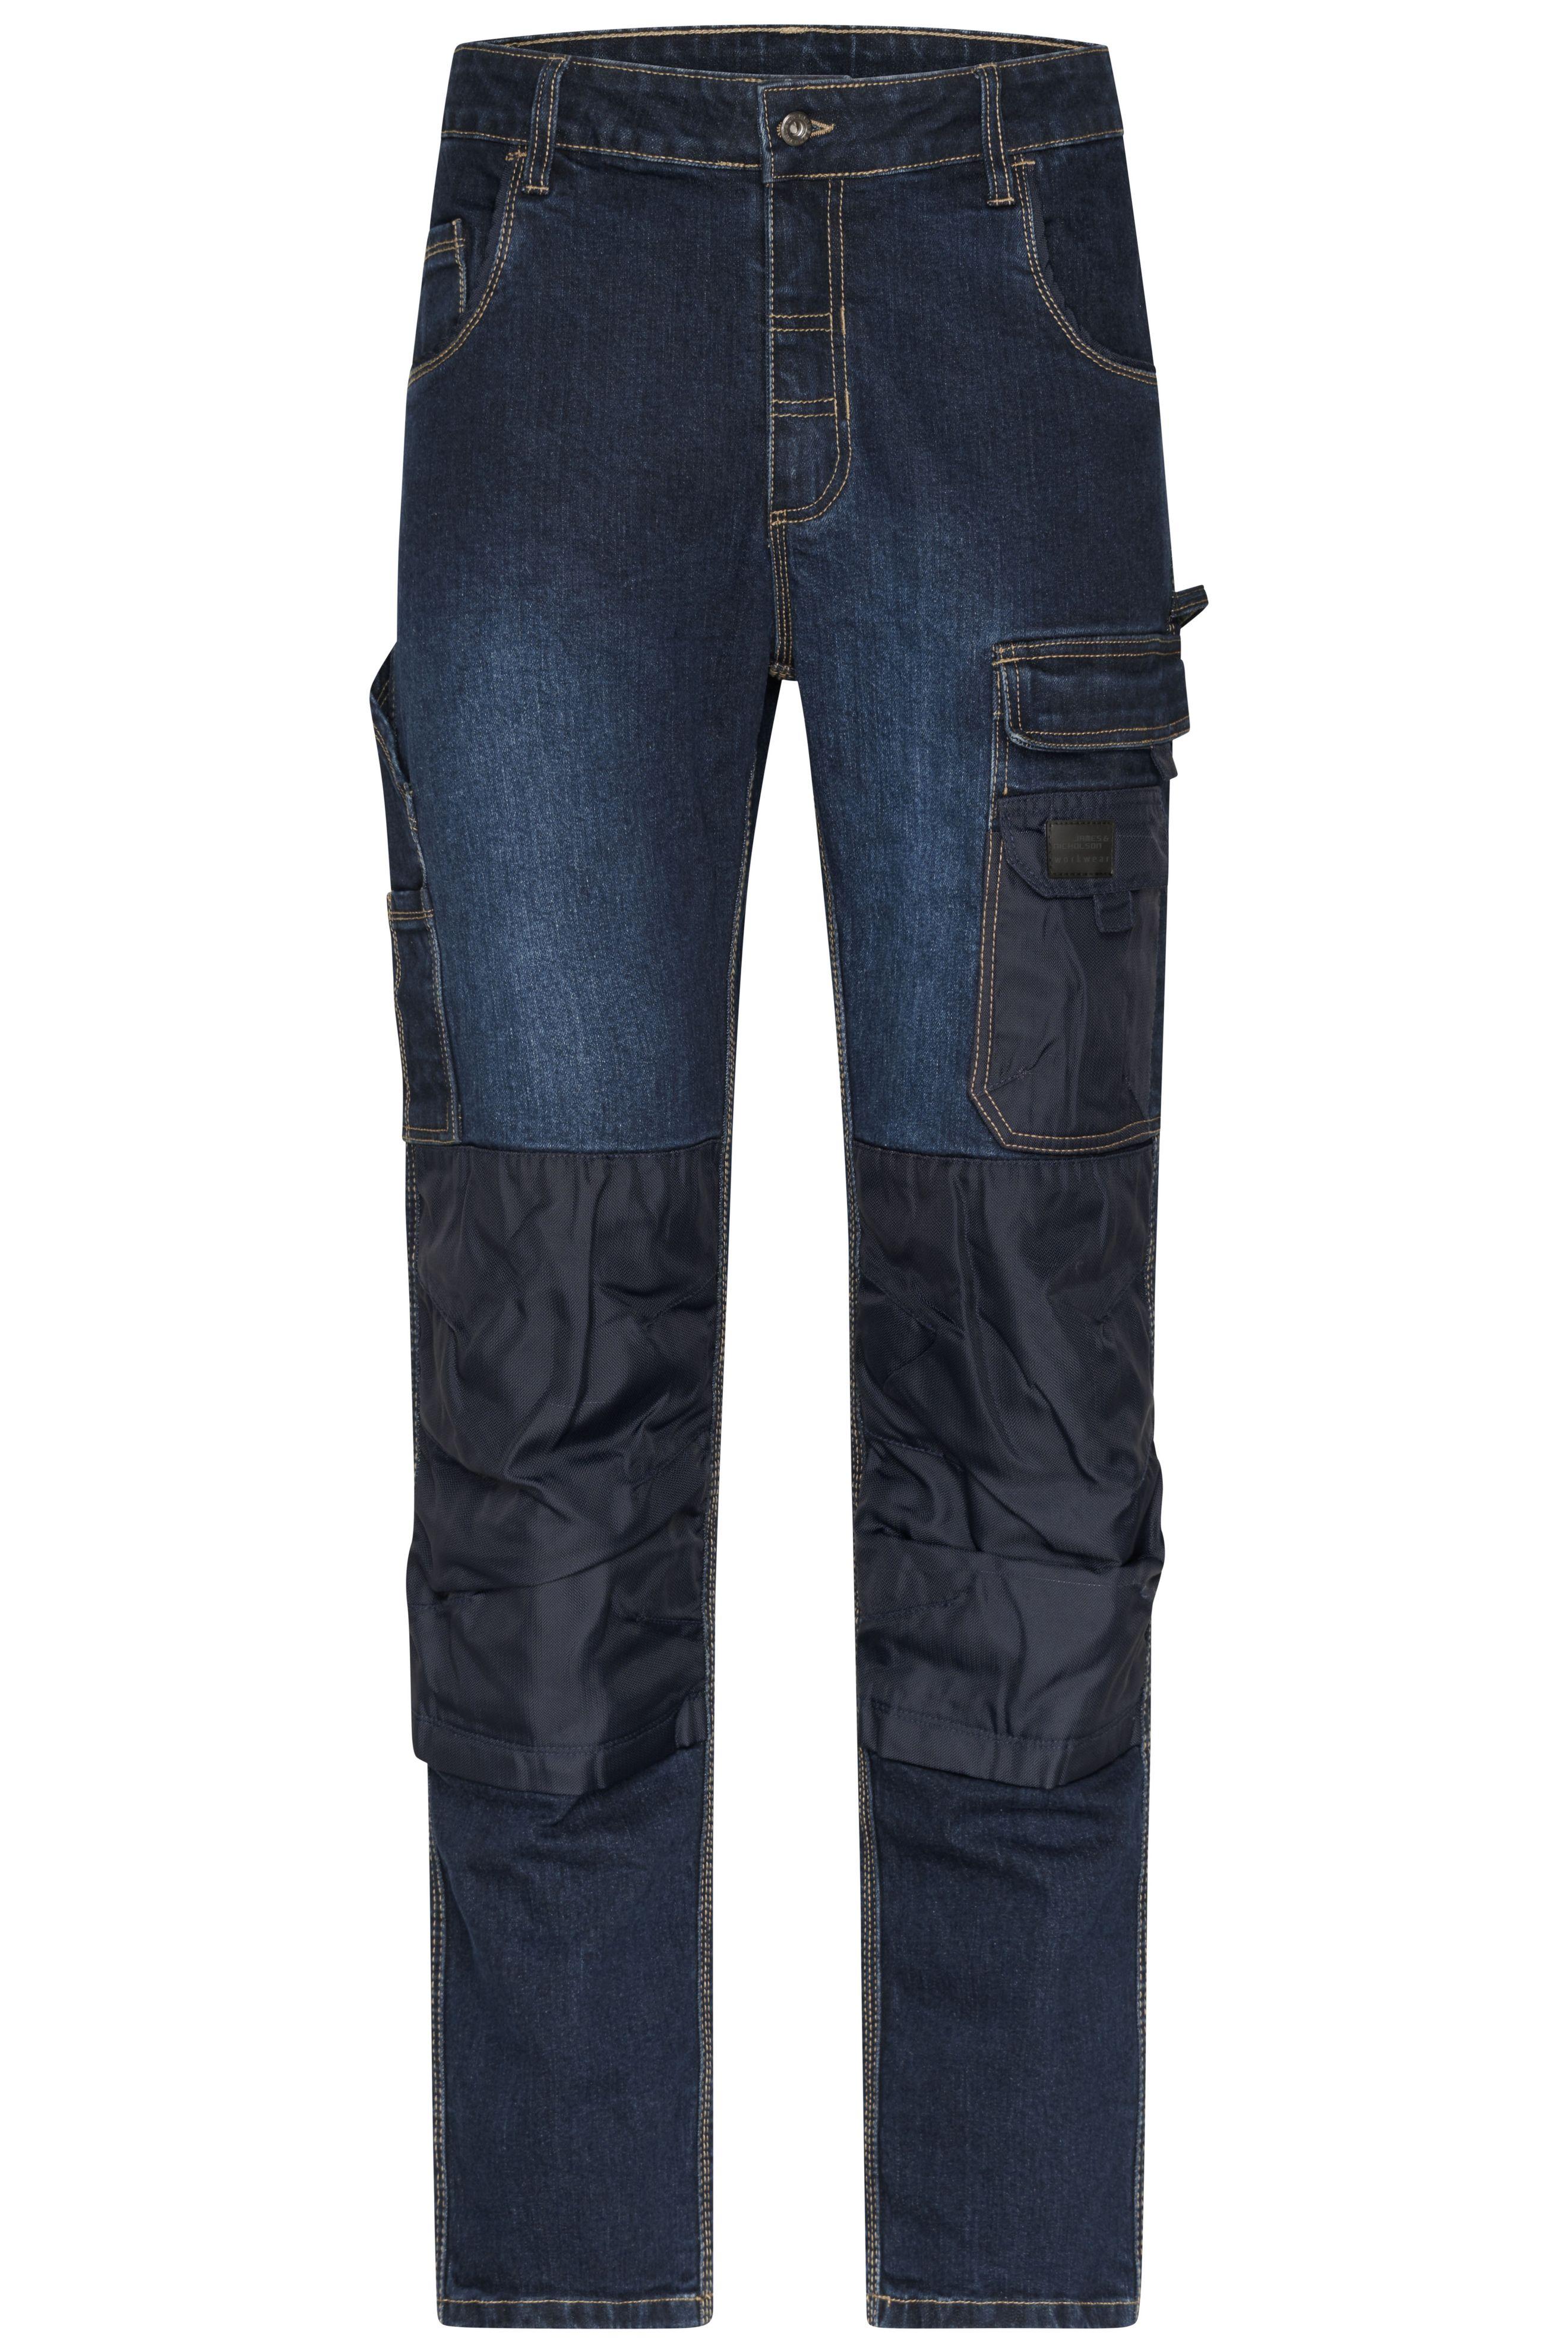 Fliegerjeans Stretch-Jeans (blue-denim)